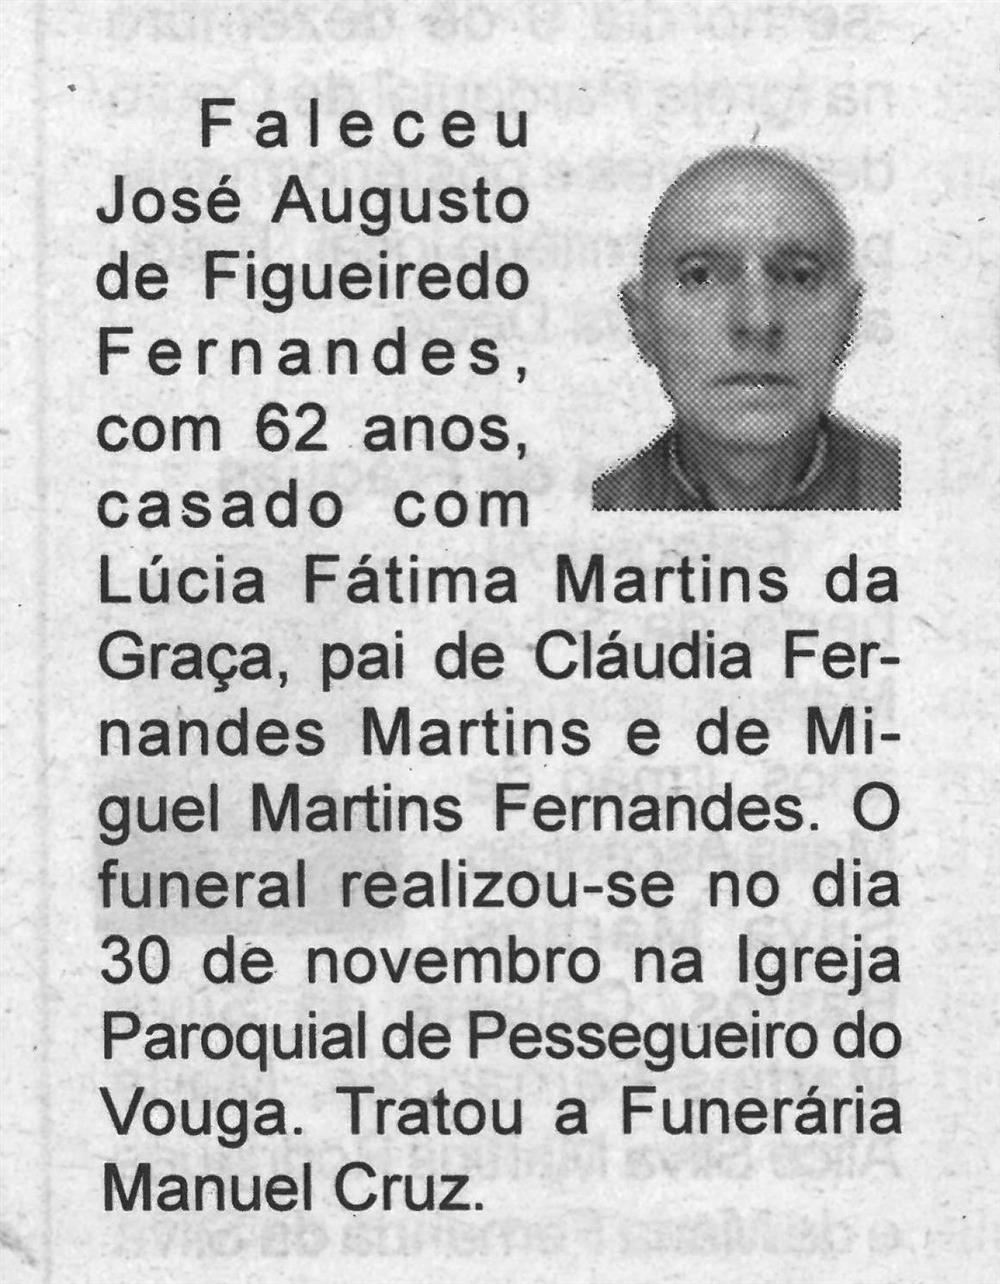 BV-2.ªdez.'20-p.13-Pessegueiro do Vouga - [José Augusto de Figueiredo Fernandes].jpg